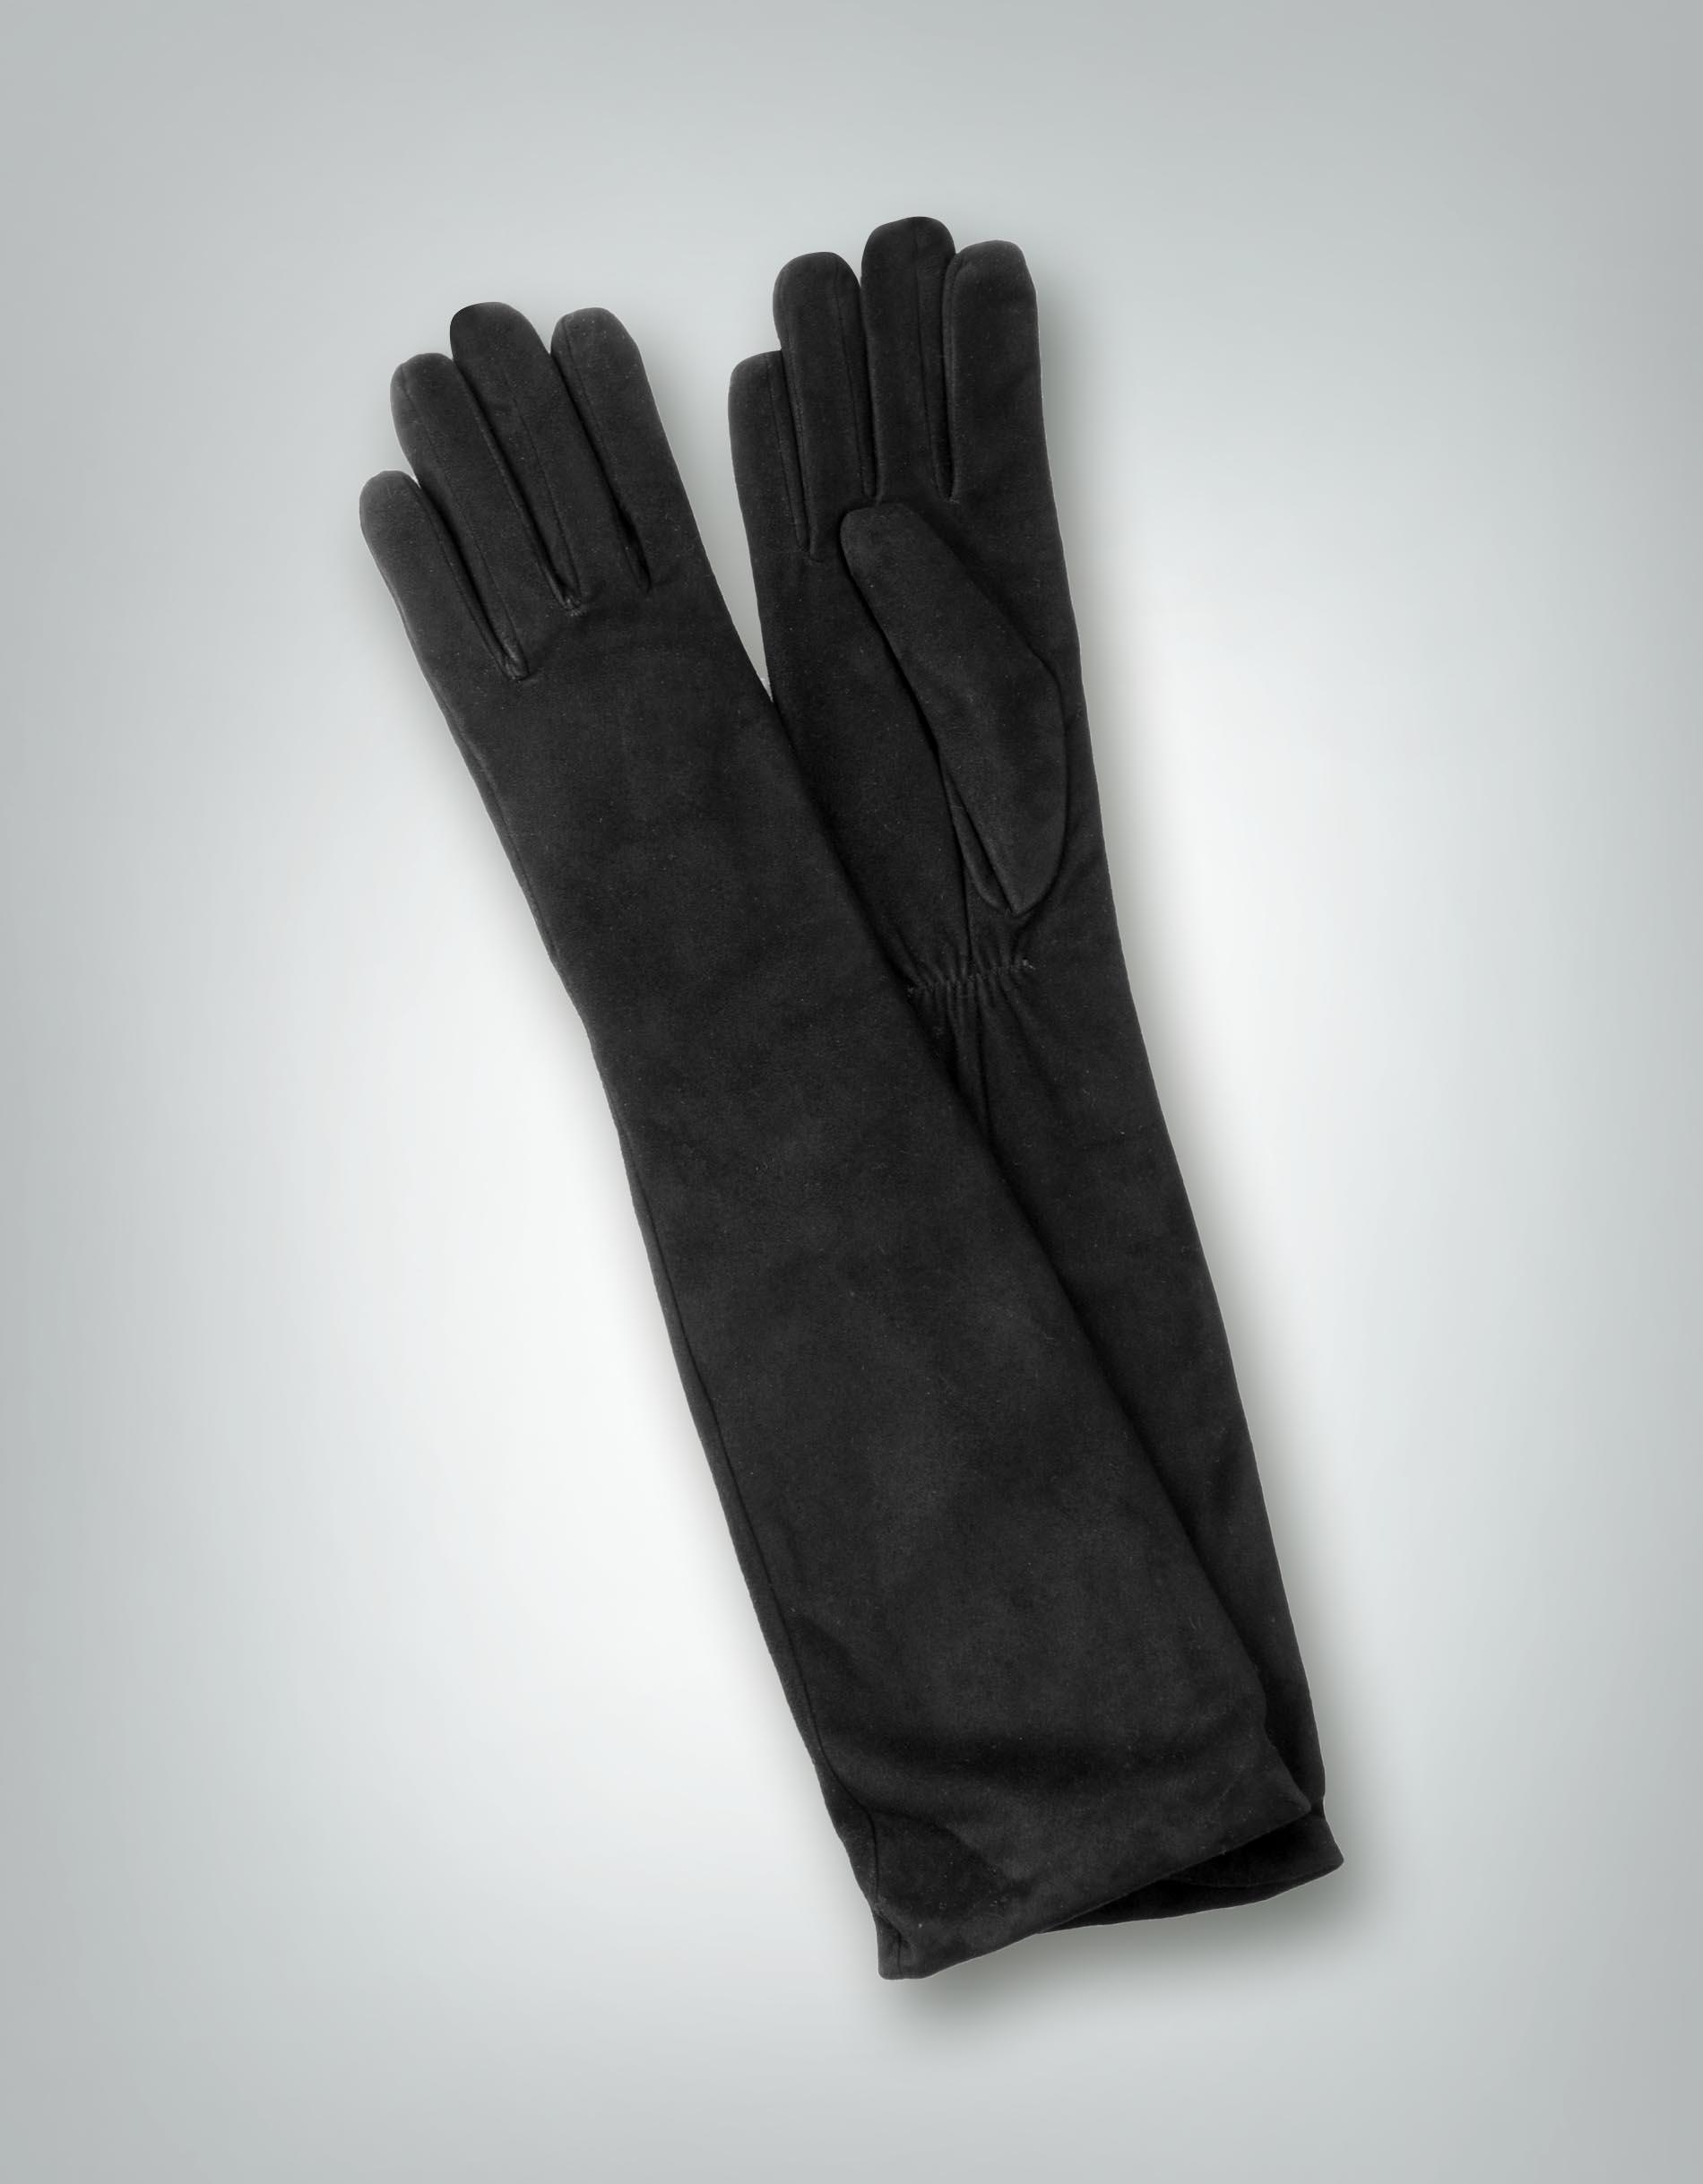 roeckl damen handschuhe veloursleder wollfutter schwarz. Black Bedroom Furniture Sets. Home Design Ideas